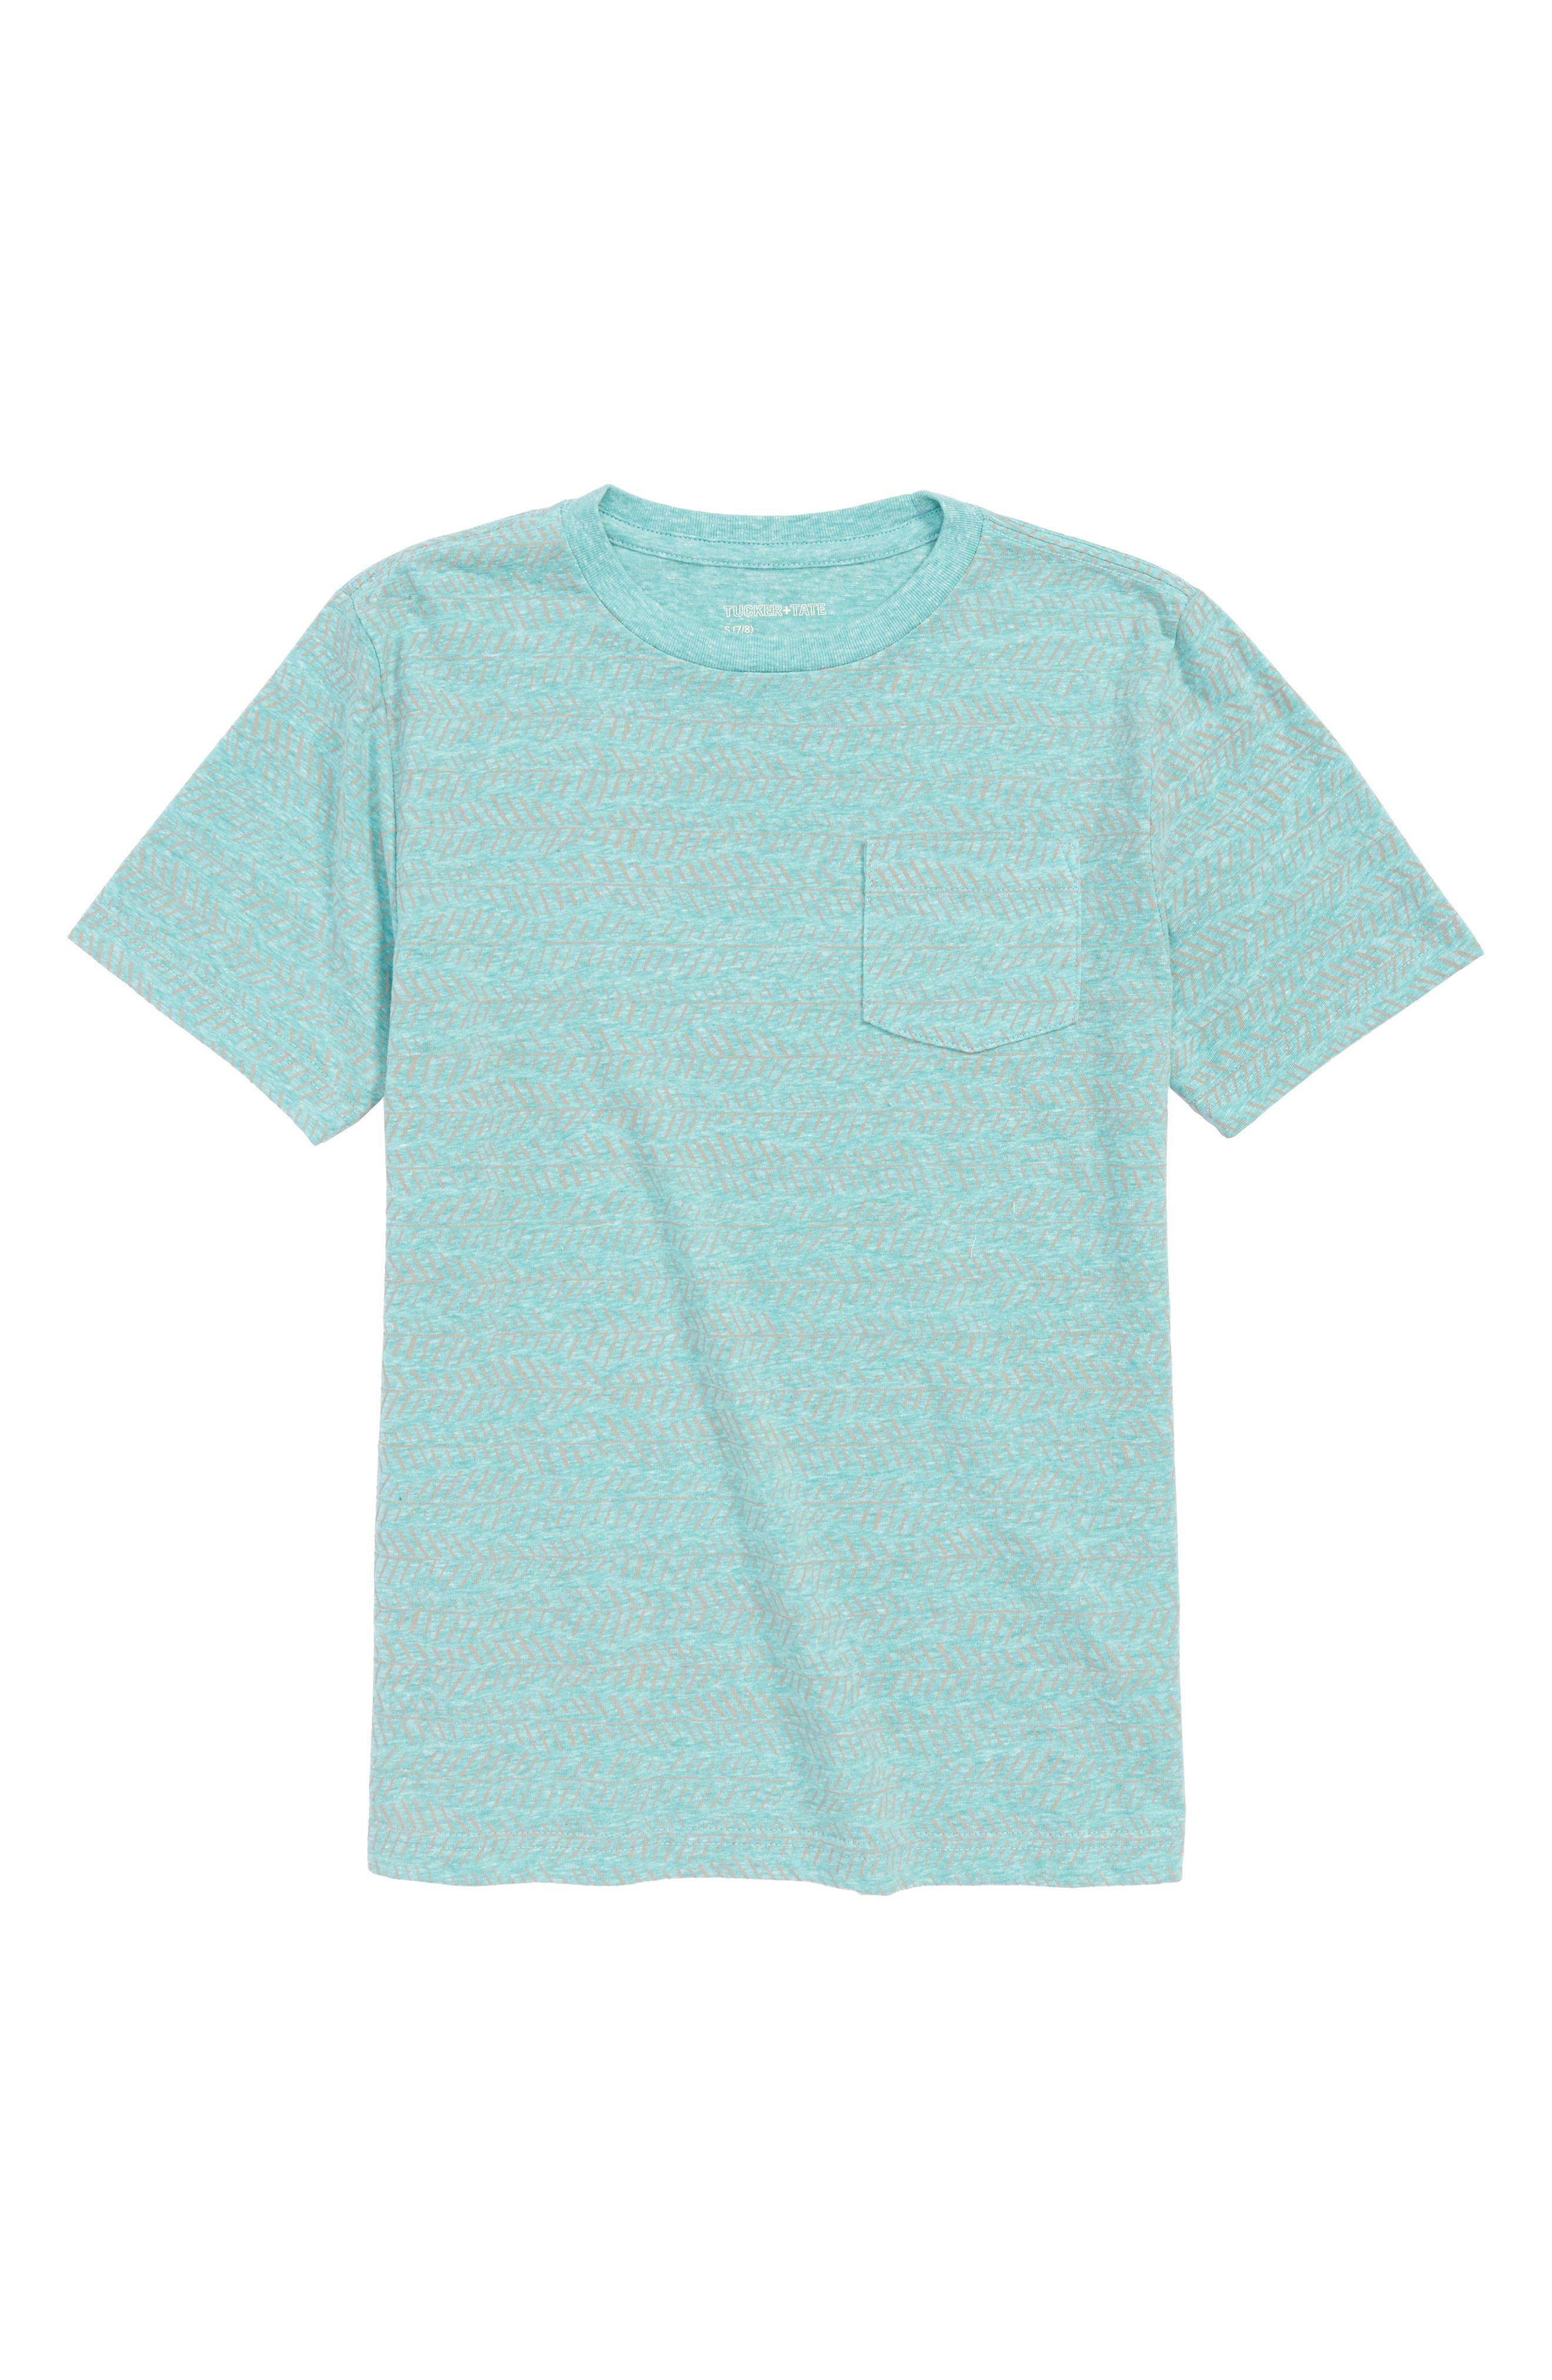 Tropical T-Shirt,                         Main,                         color, 301